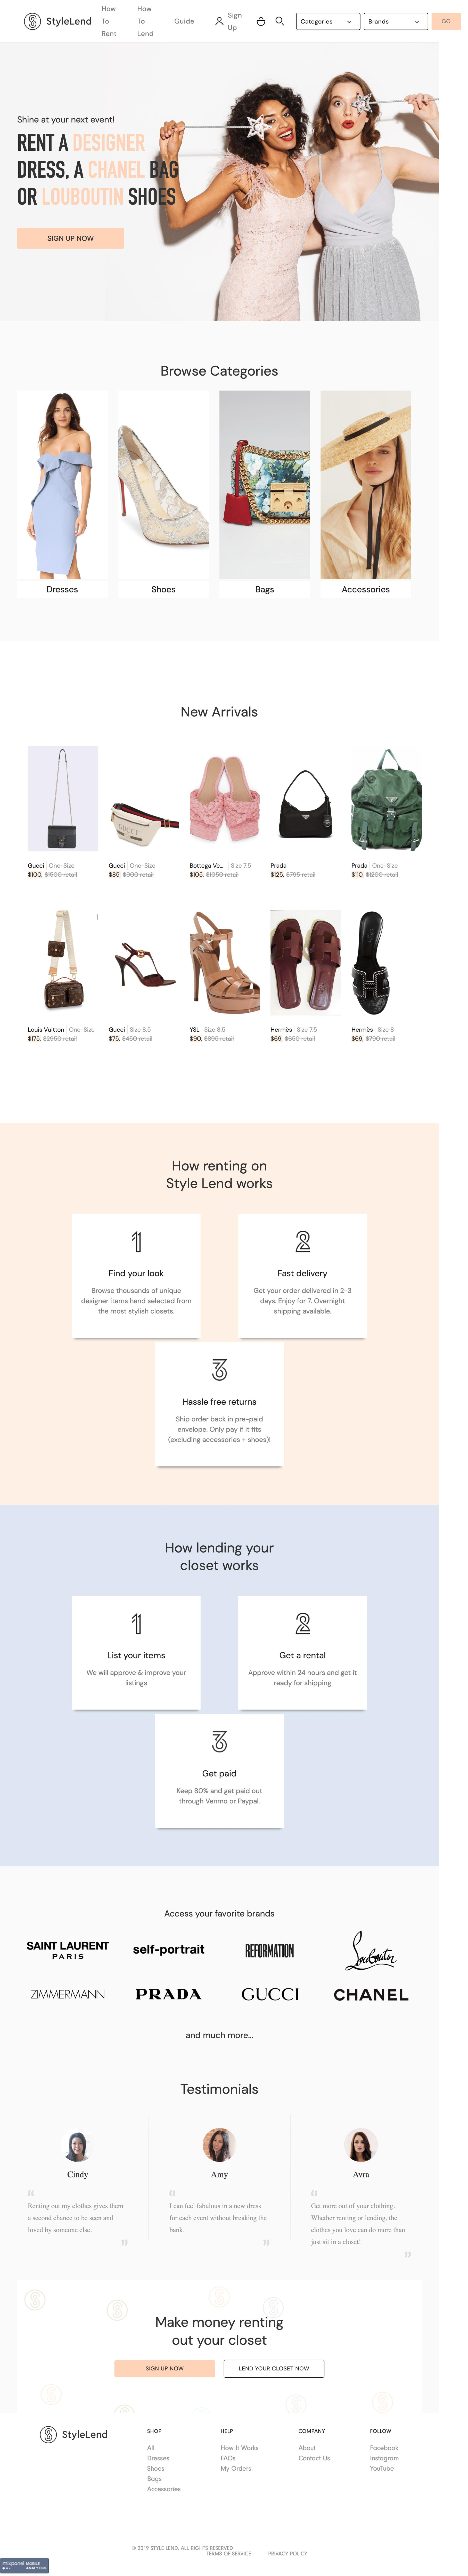 Style Lend Website Image